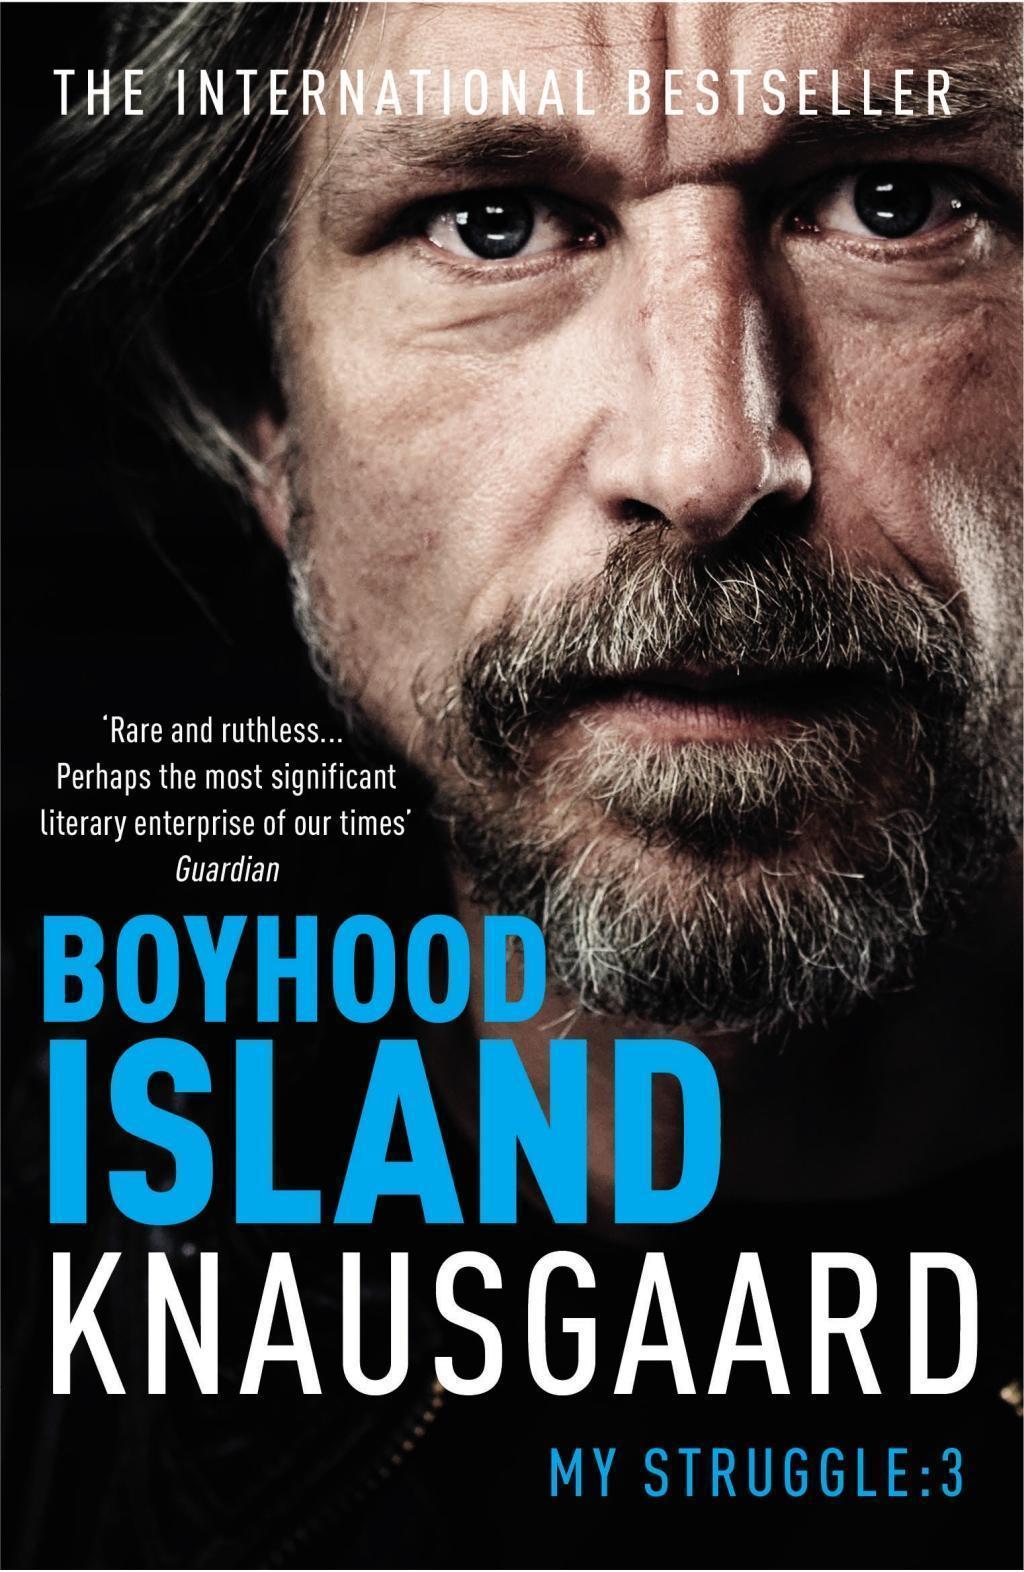 Boyhood Island